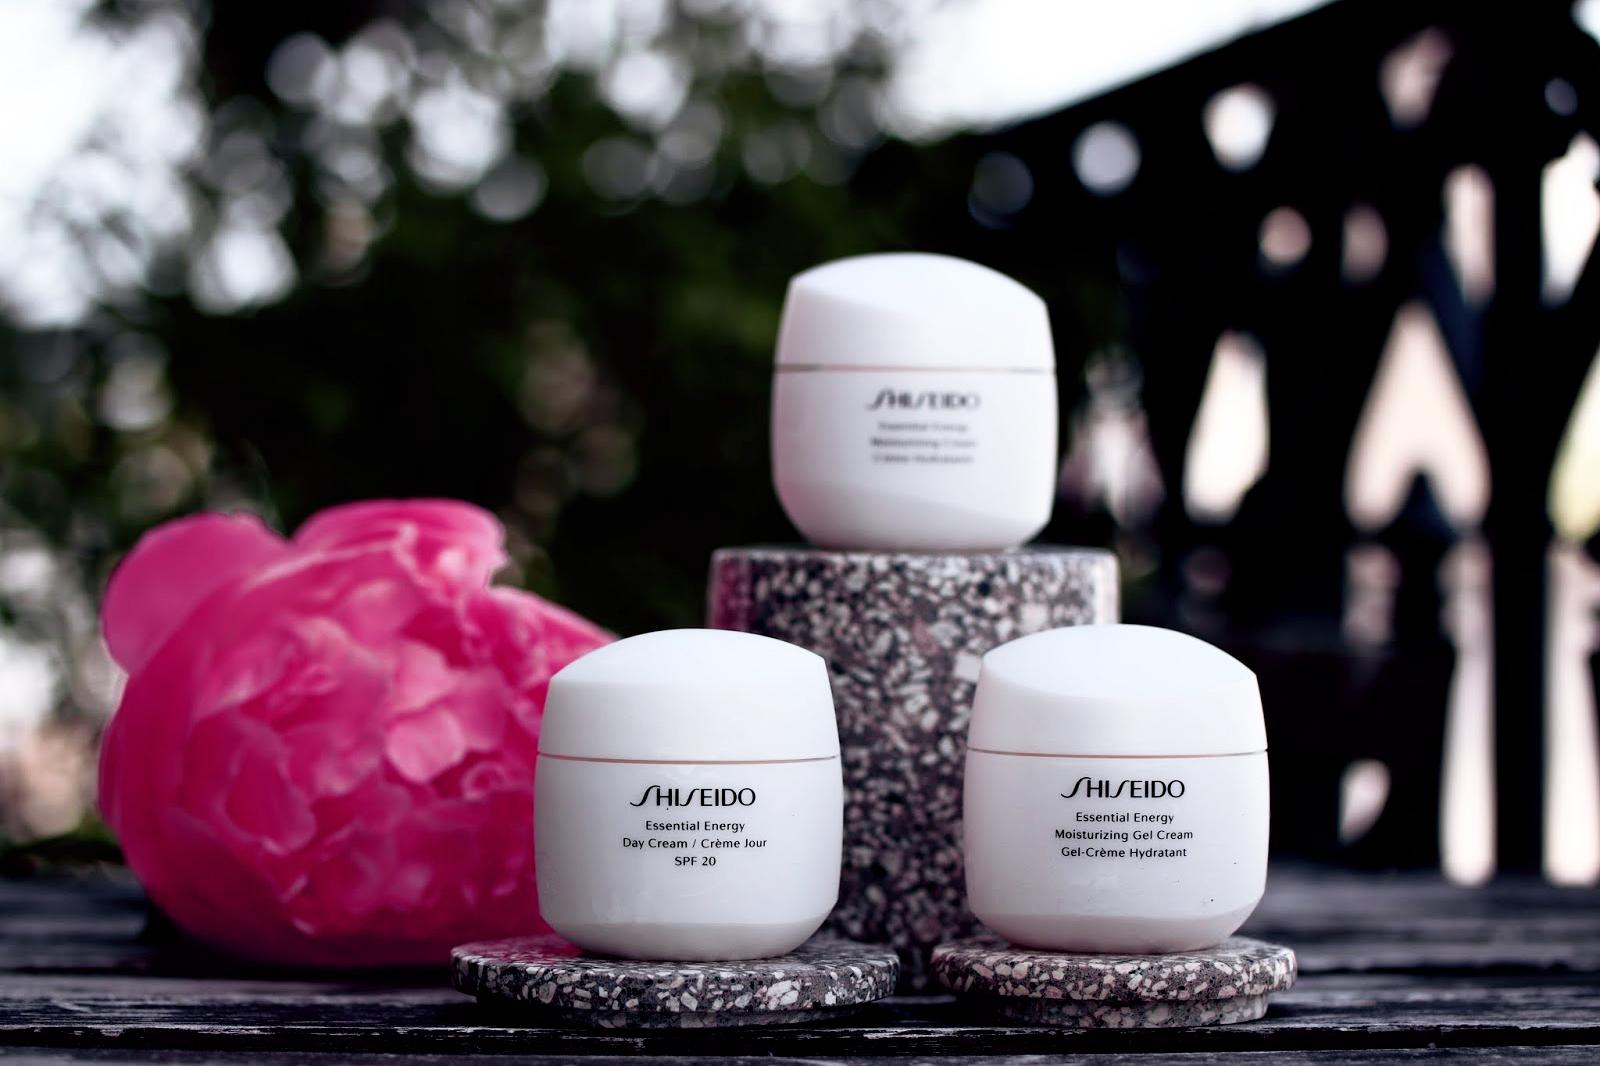 shiseido essential energy soins hydratants creme avis test